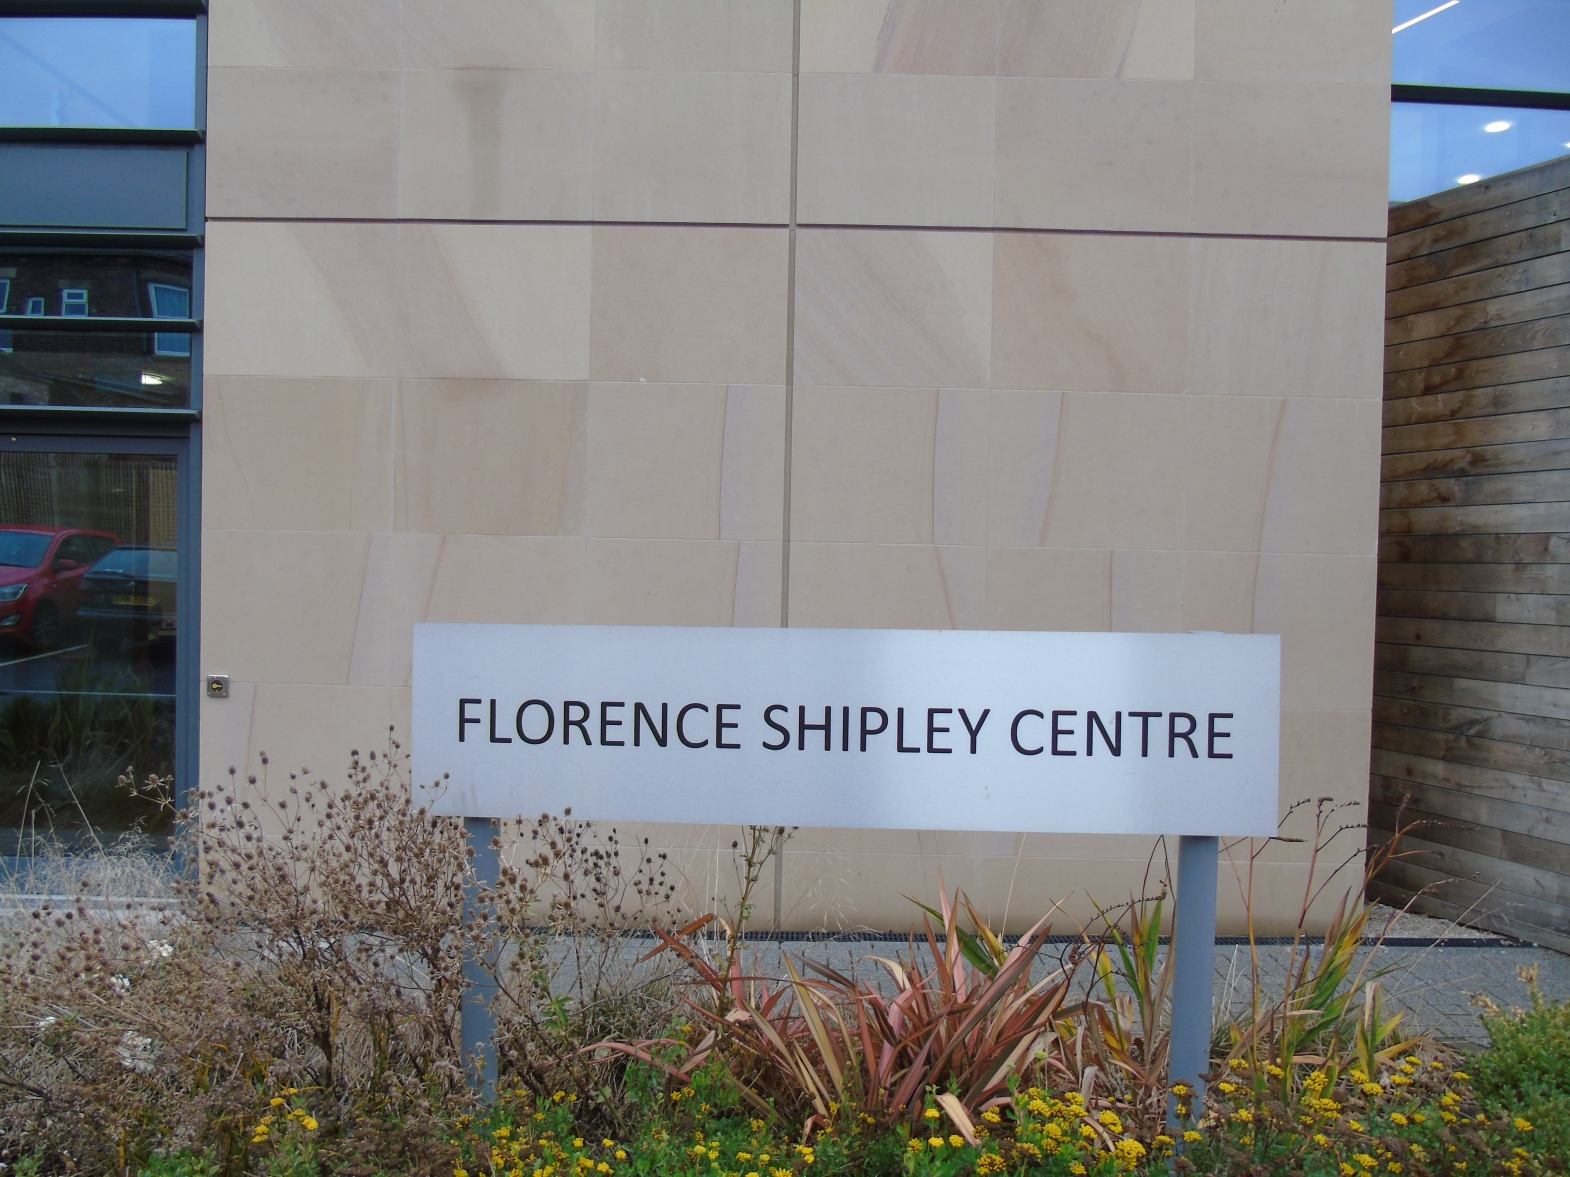 Florence Shipley